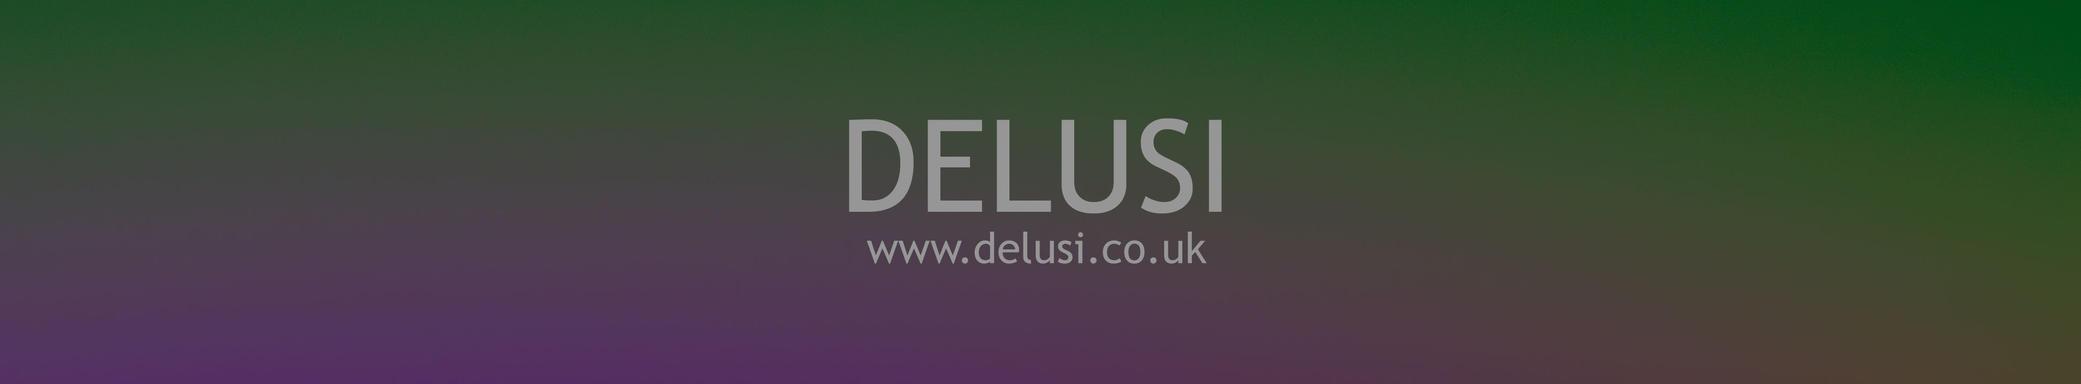 Delusi-Bandcamp-Header by DelusiUK